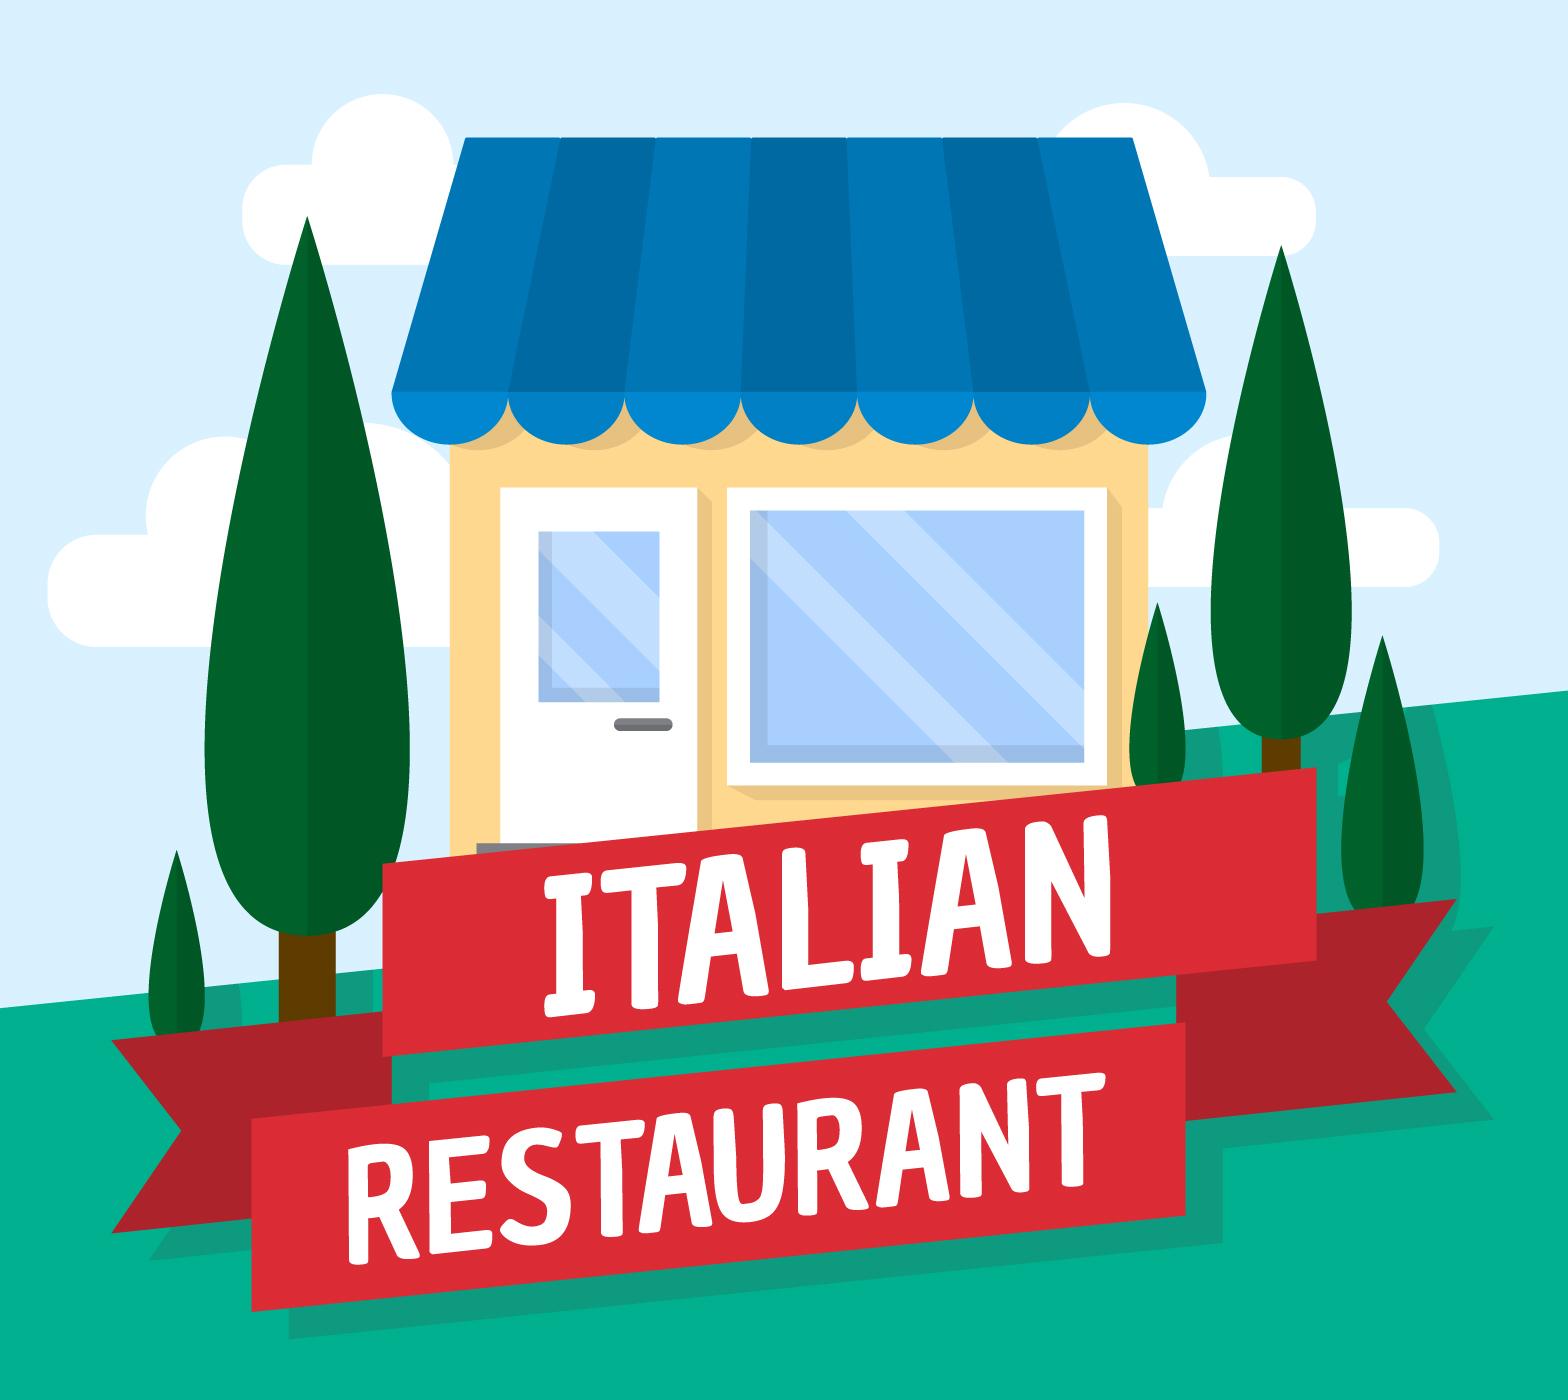 Italian Restaurant Download Free Vectors Clipart Graphics Vector Art